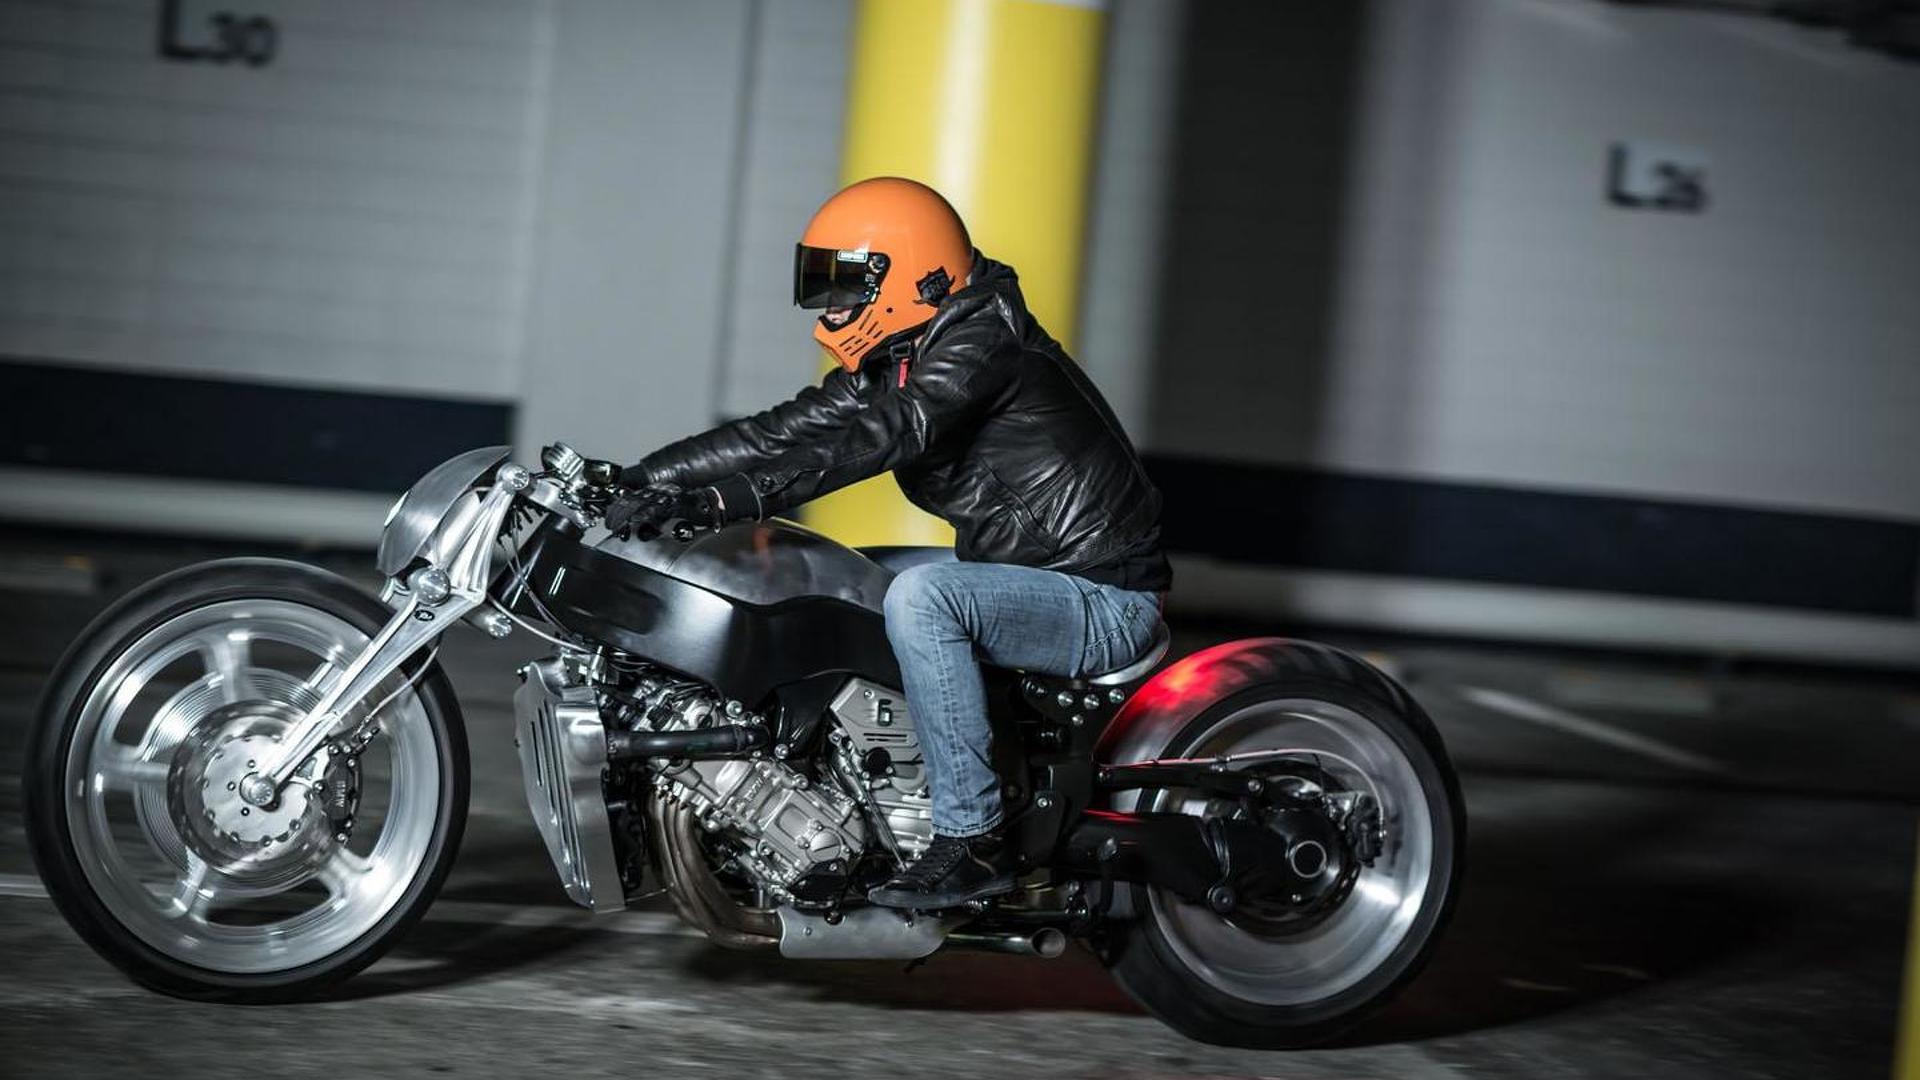 BMW Motorrad unveils two custom bikes based on the K 1600 GTL